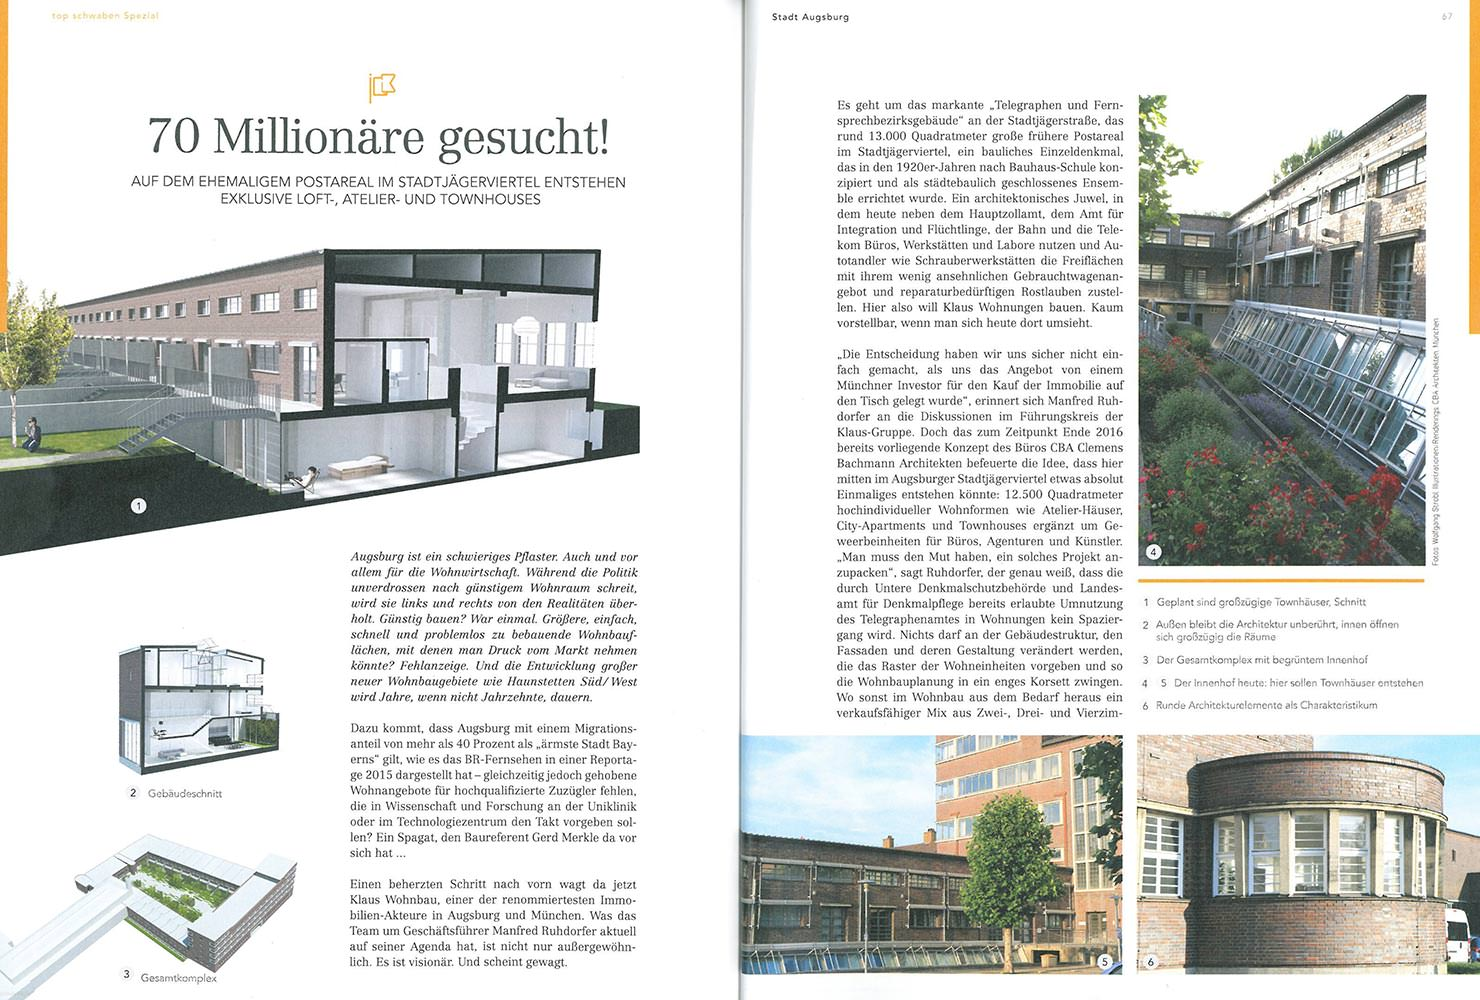 Len Augsburg top schwaben magazine telegraph office augsburg cba clemens